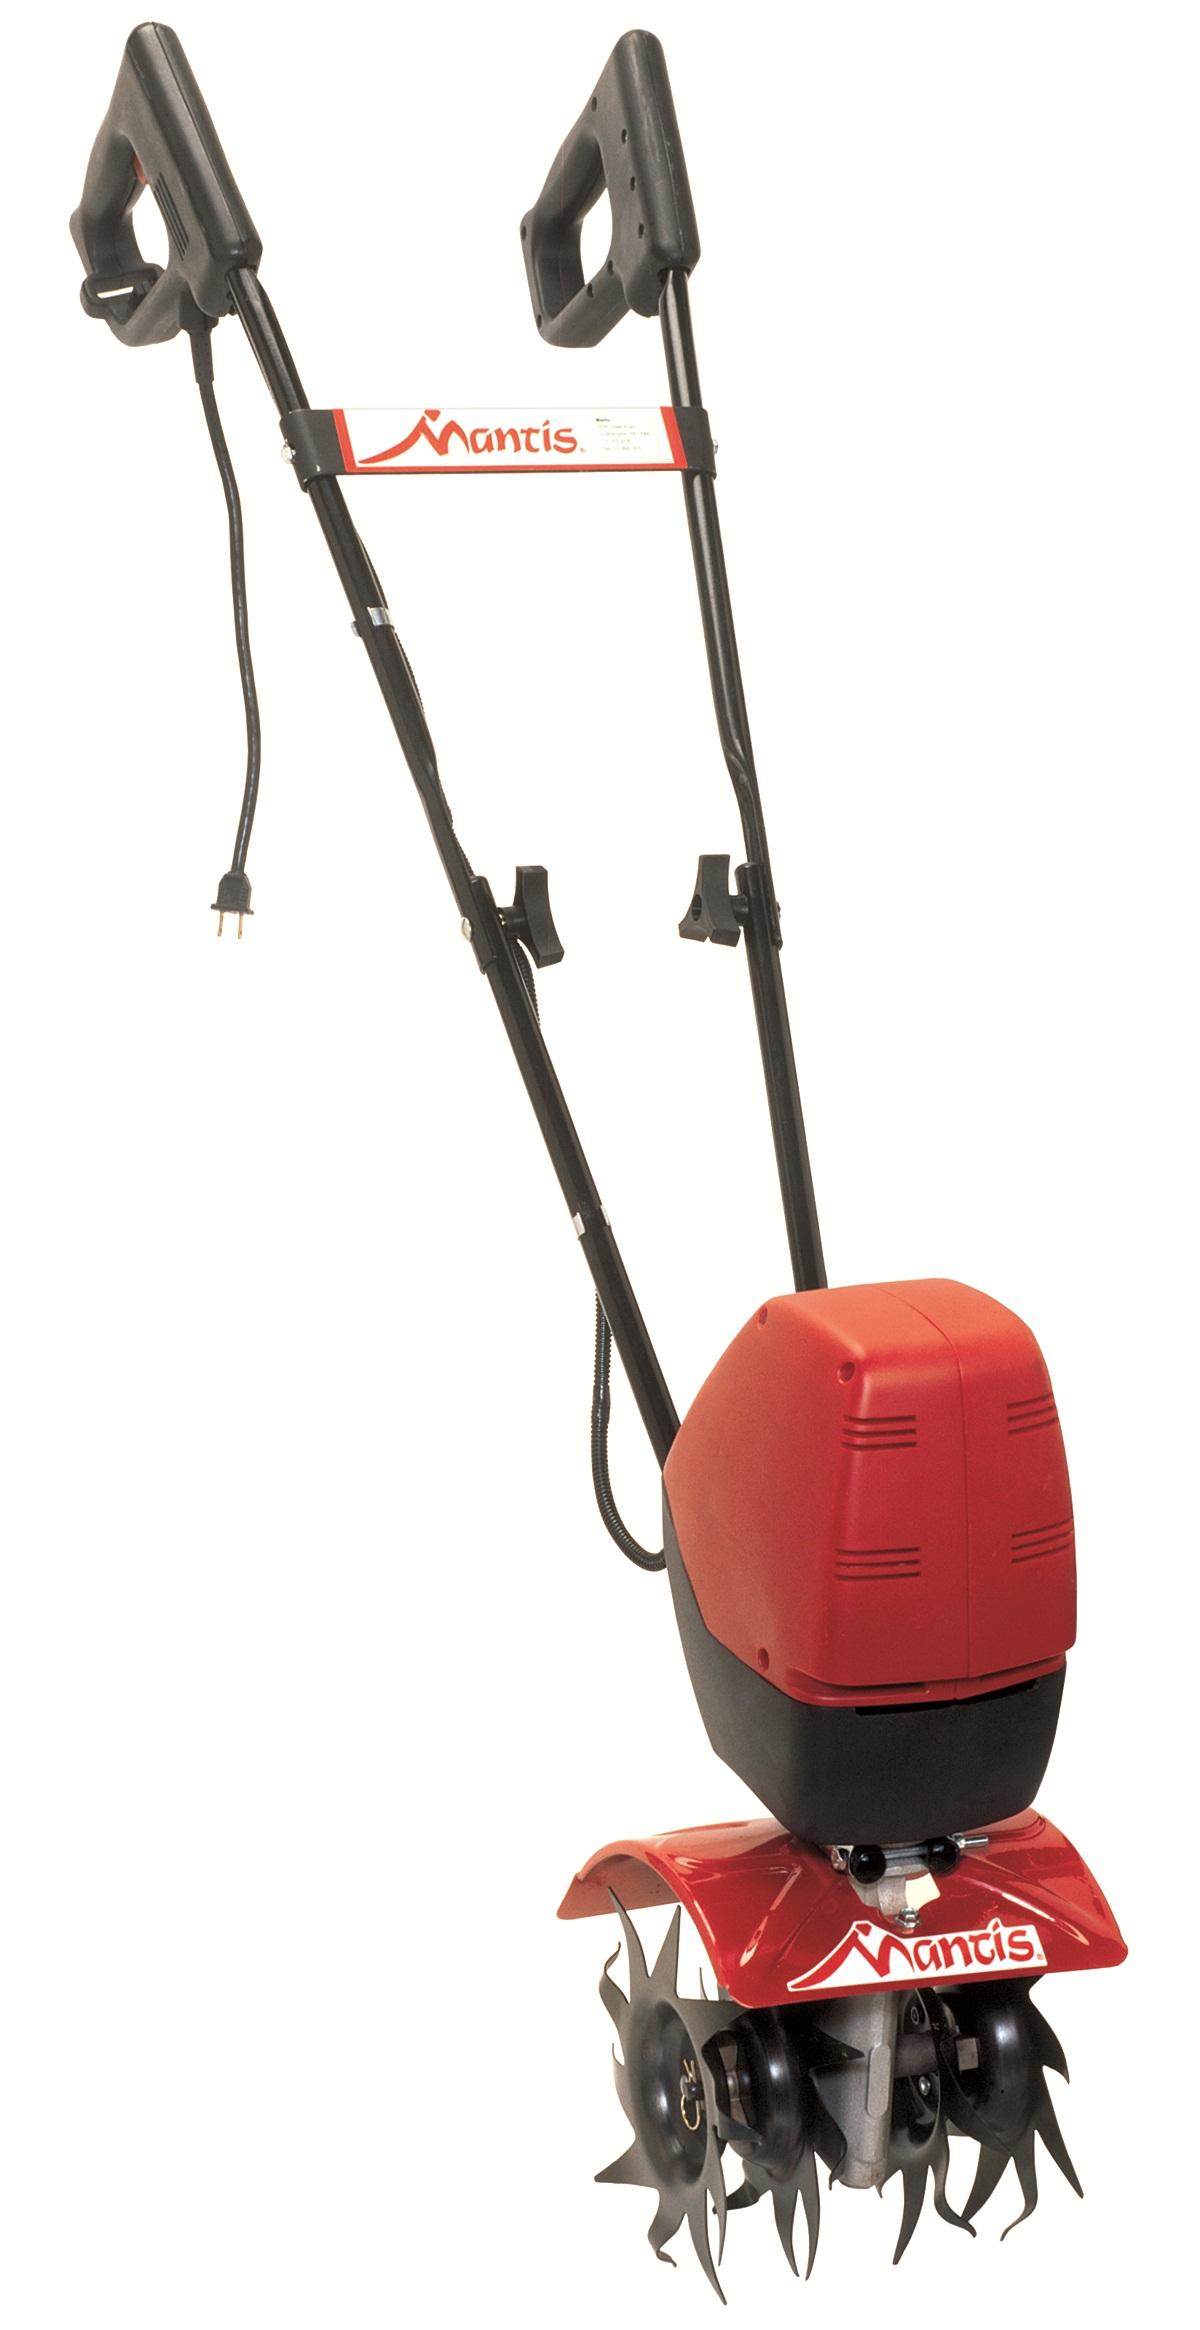 Культиватор Mantis Electro 7252-00-18